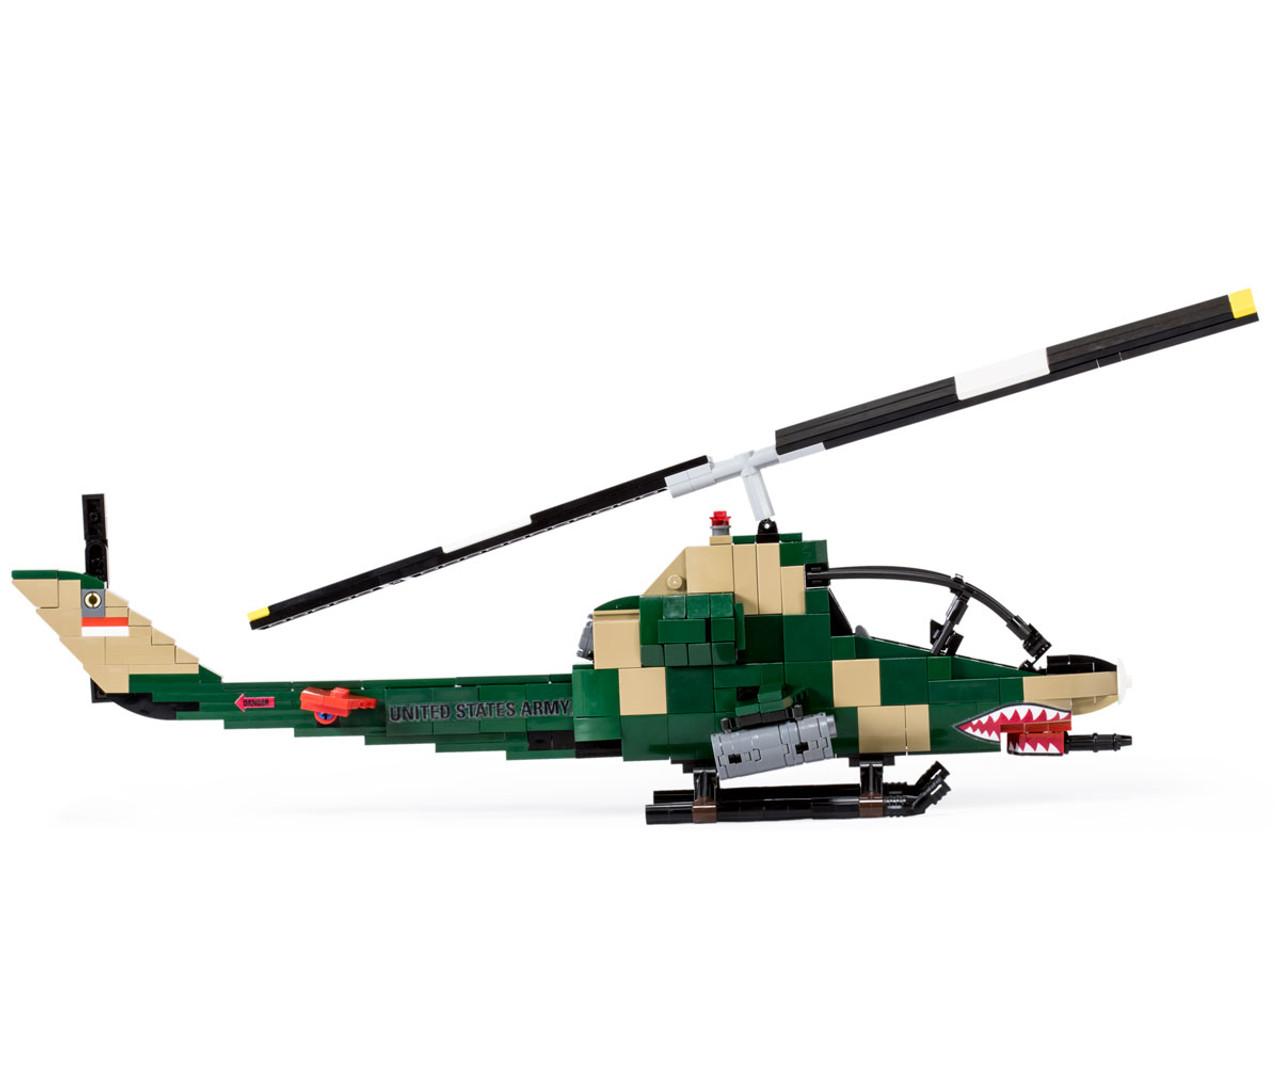 AH-1G Cobra Gunship